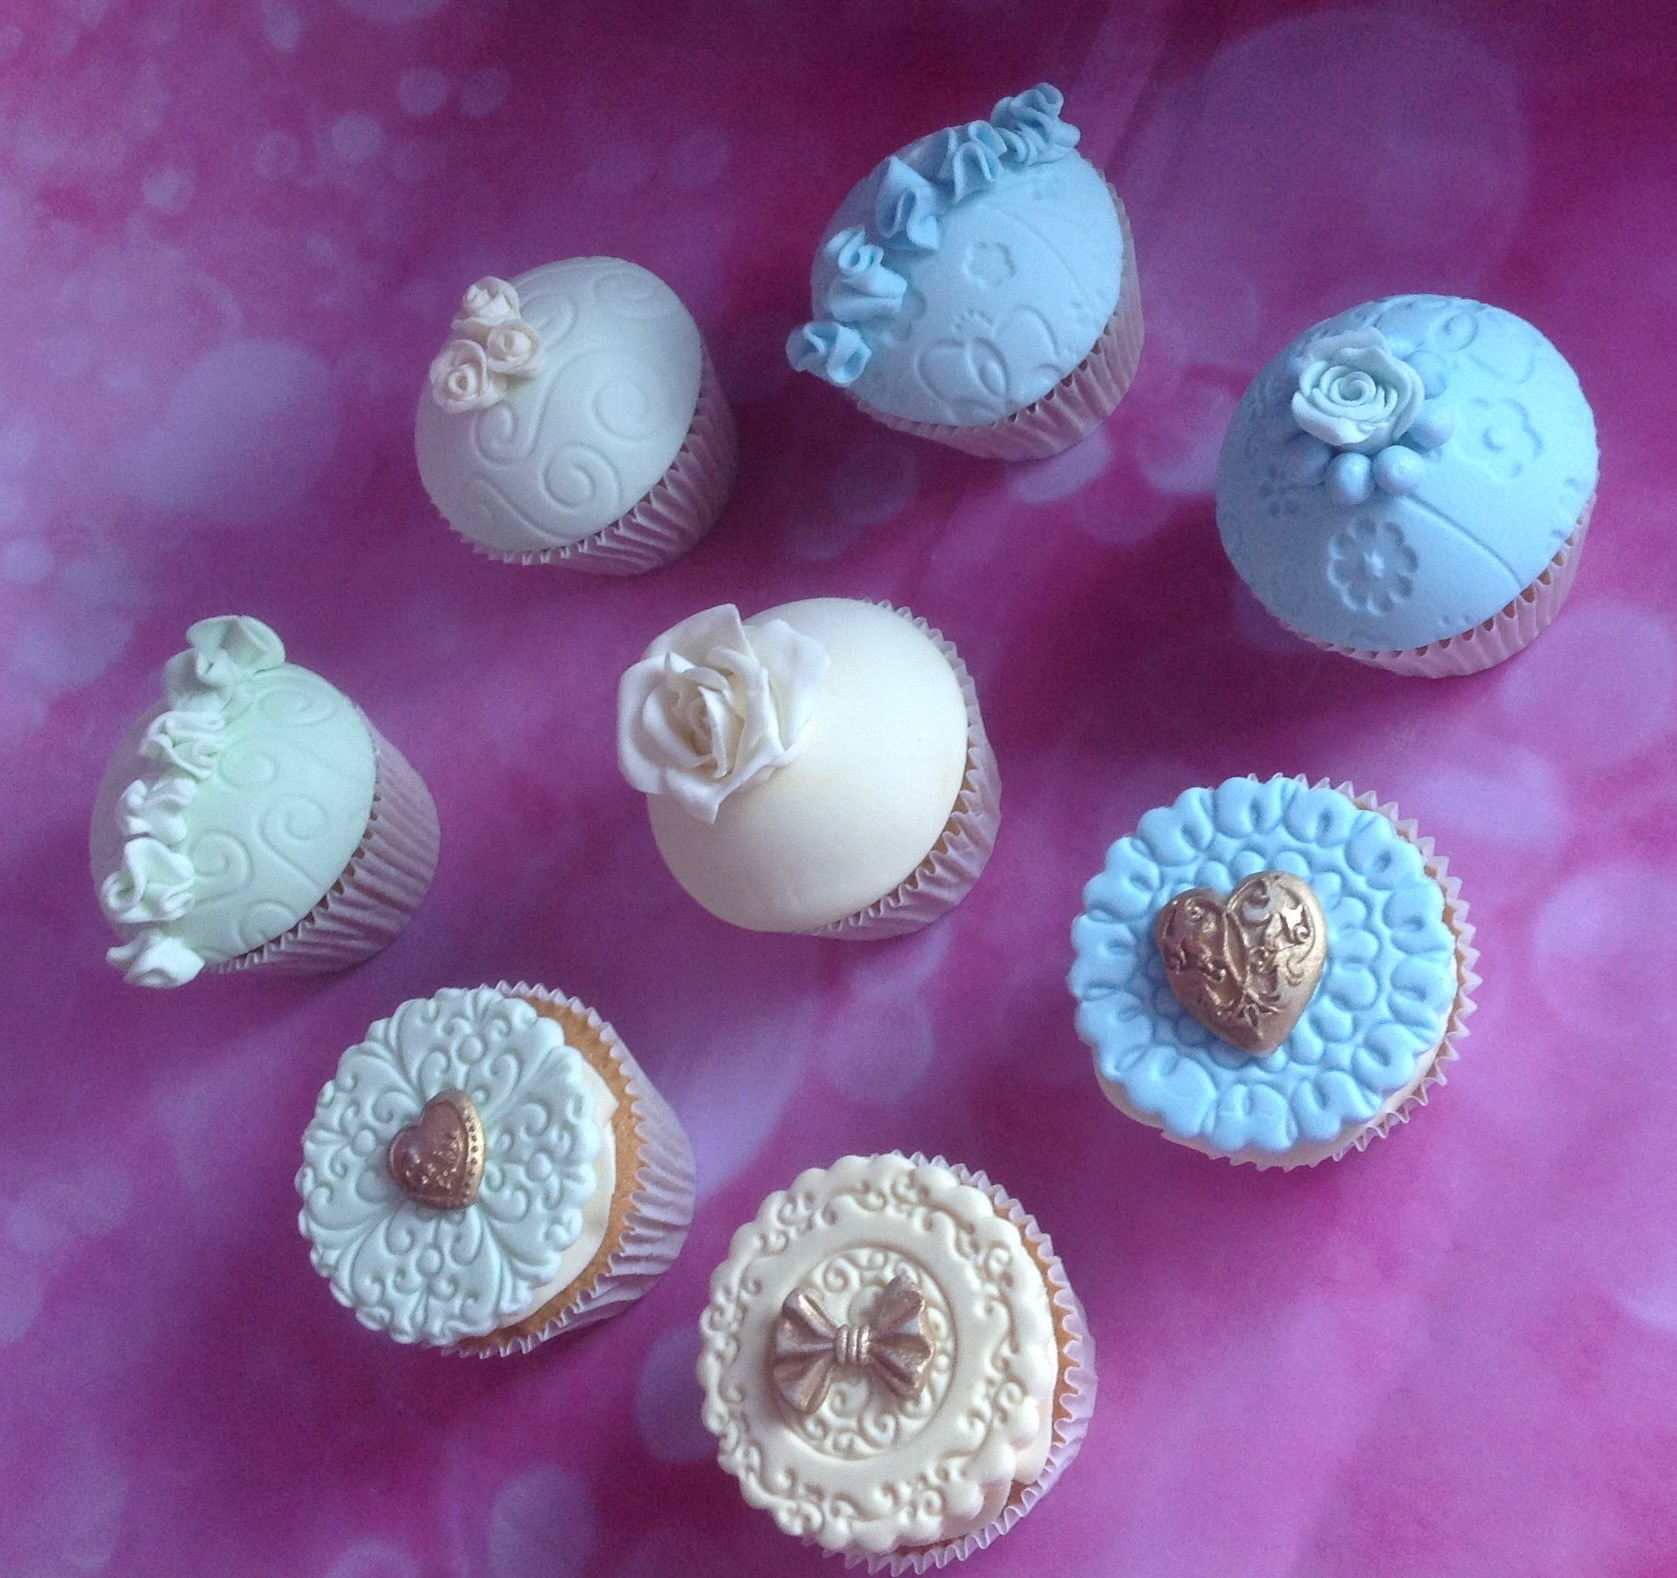 Bespoke Topper Cupcakes